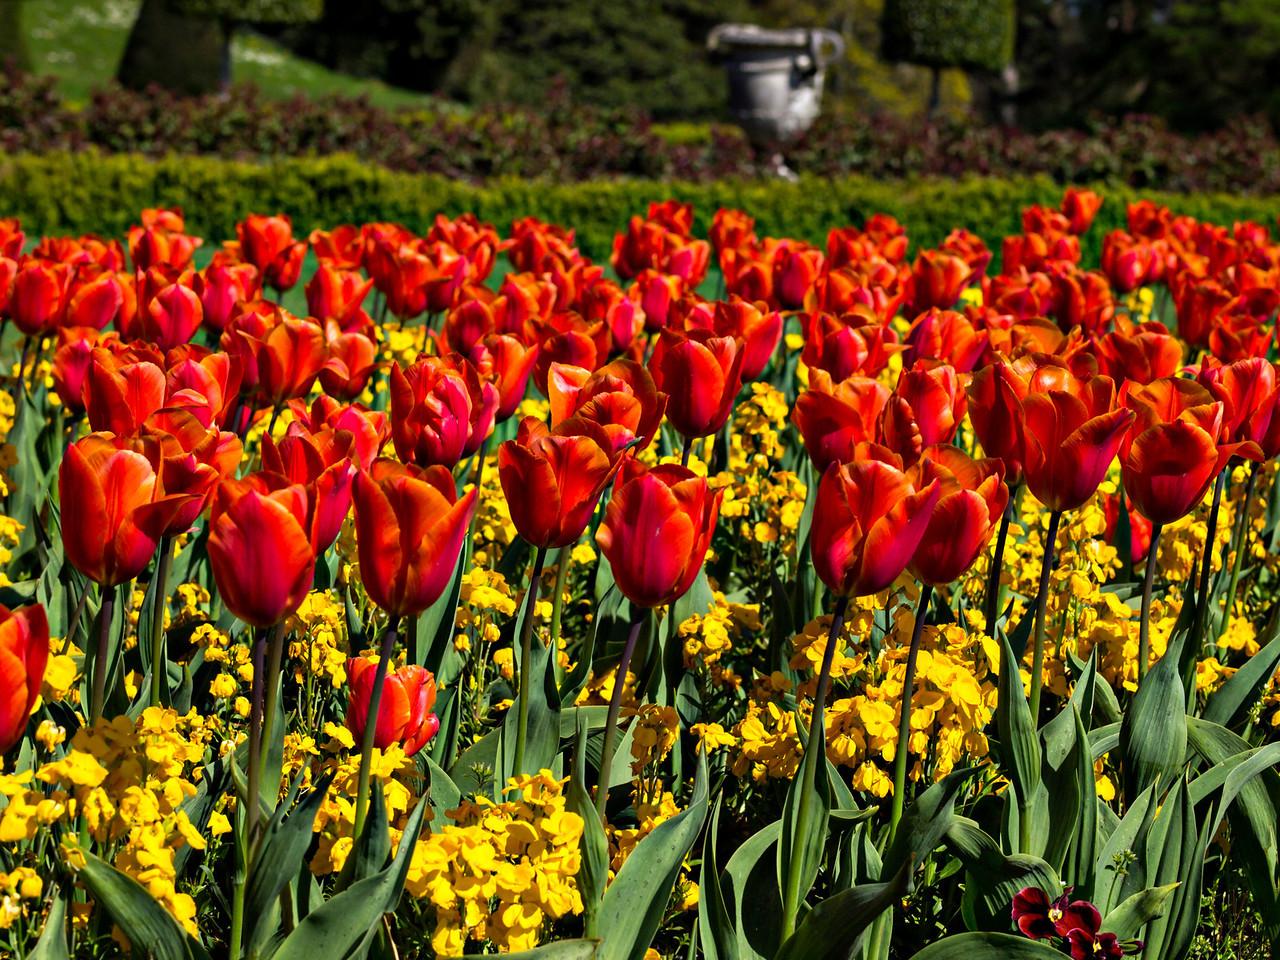 Tulips in the Powerscourt Gardens